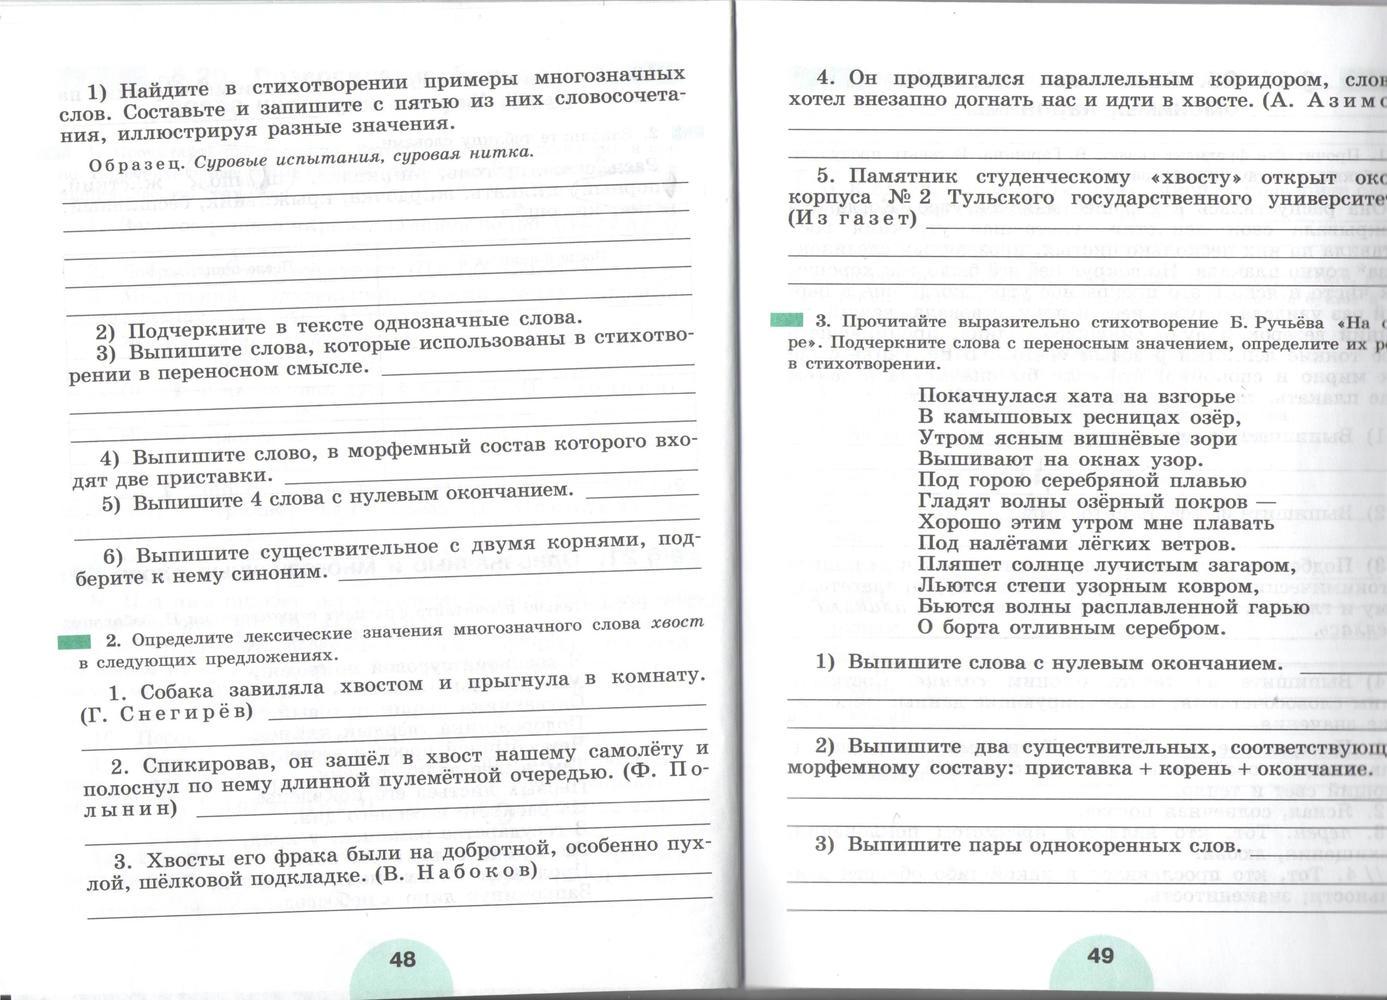 Гдз по русскому языку рабочая тетрадь 1 часть 5 класс рыбченкова